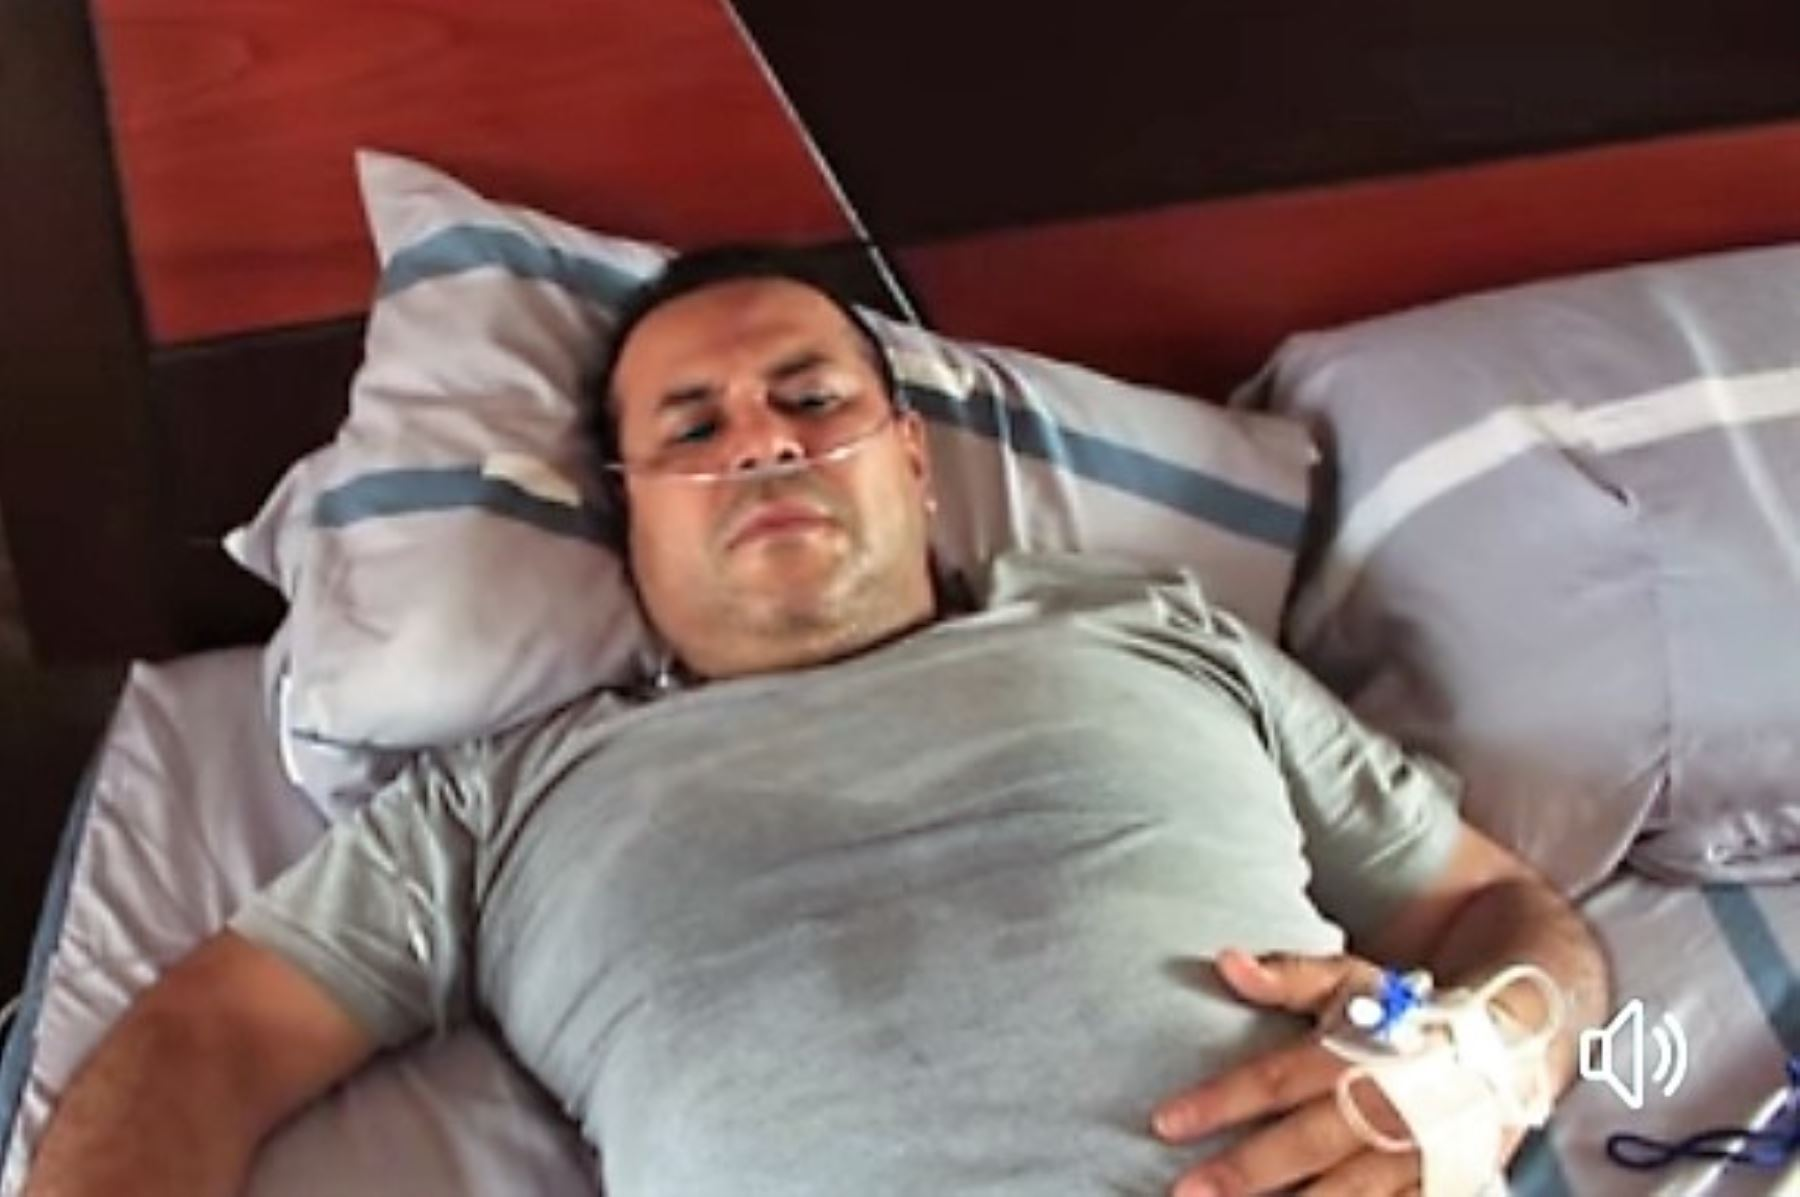 Alcalde de Chiclayo, Marco Gasco, confirma que se contagió de covid-19.